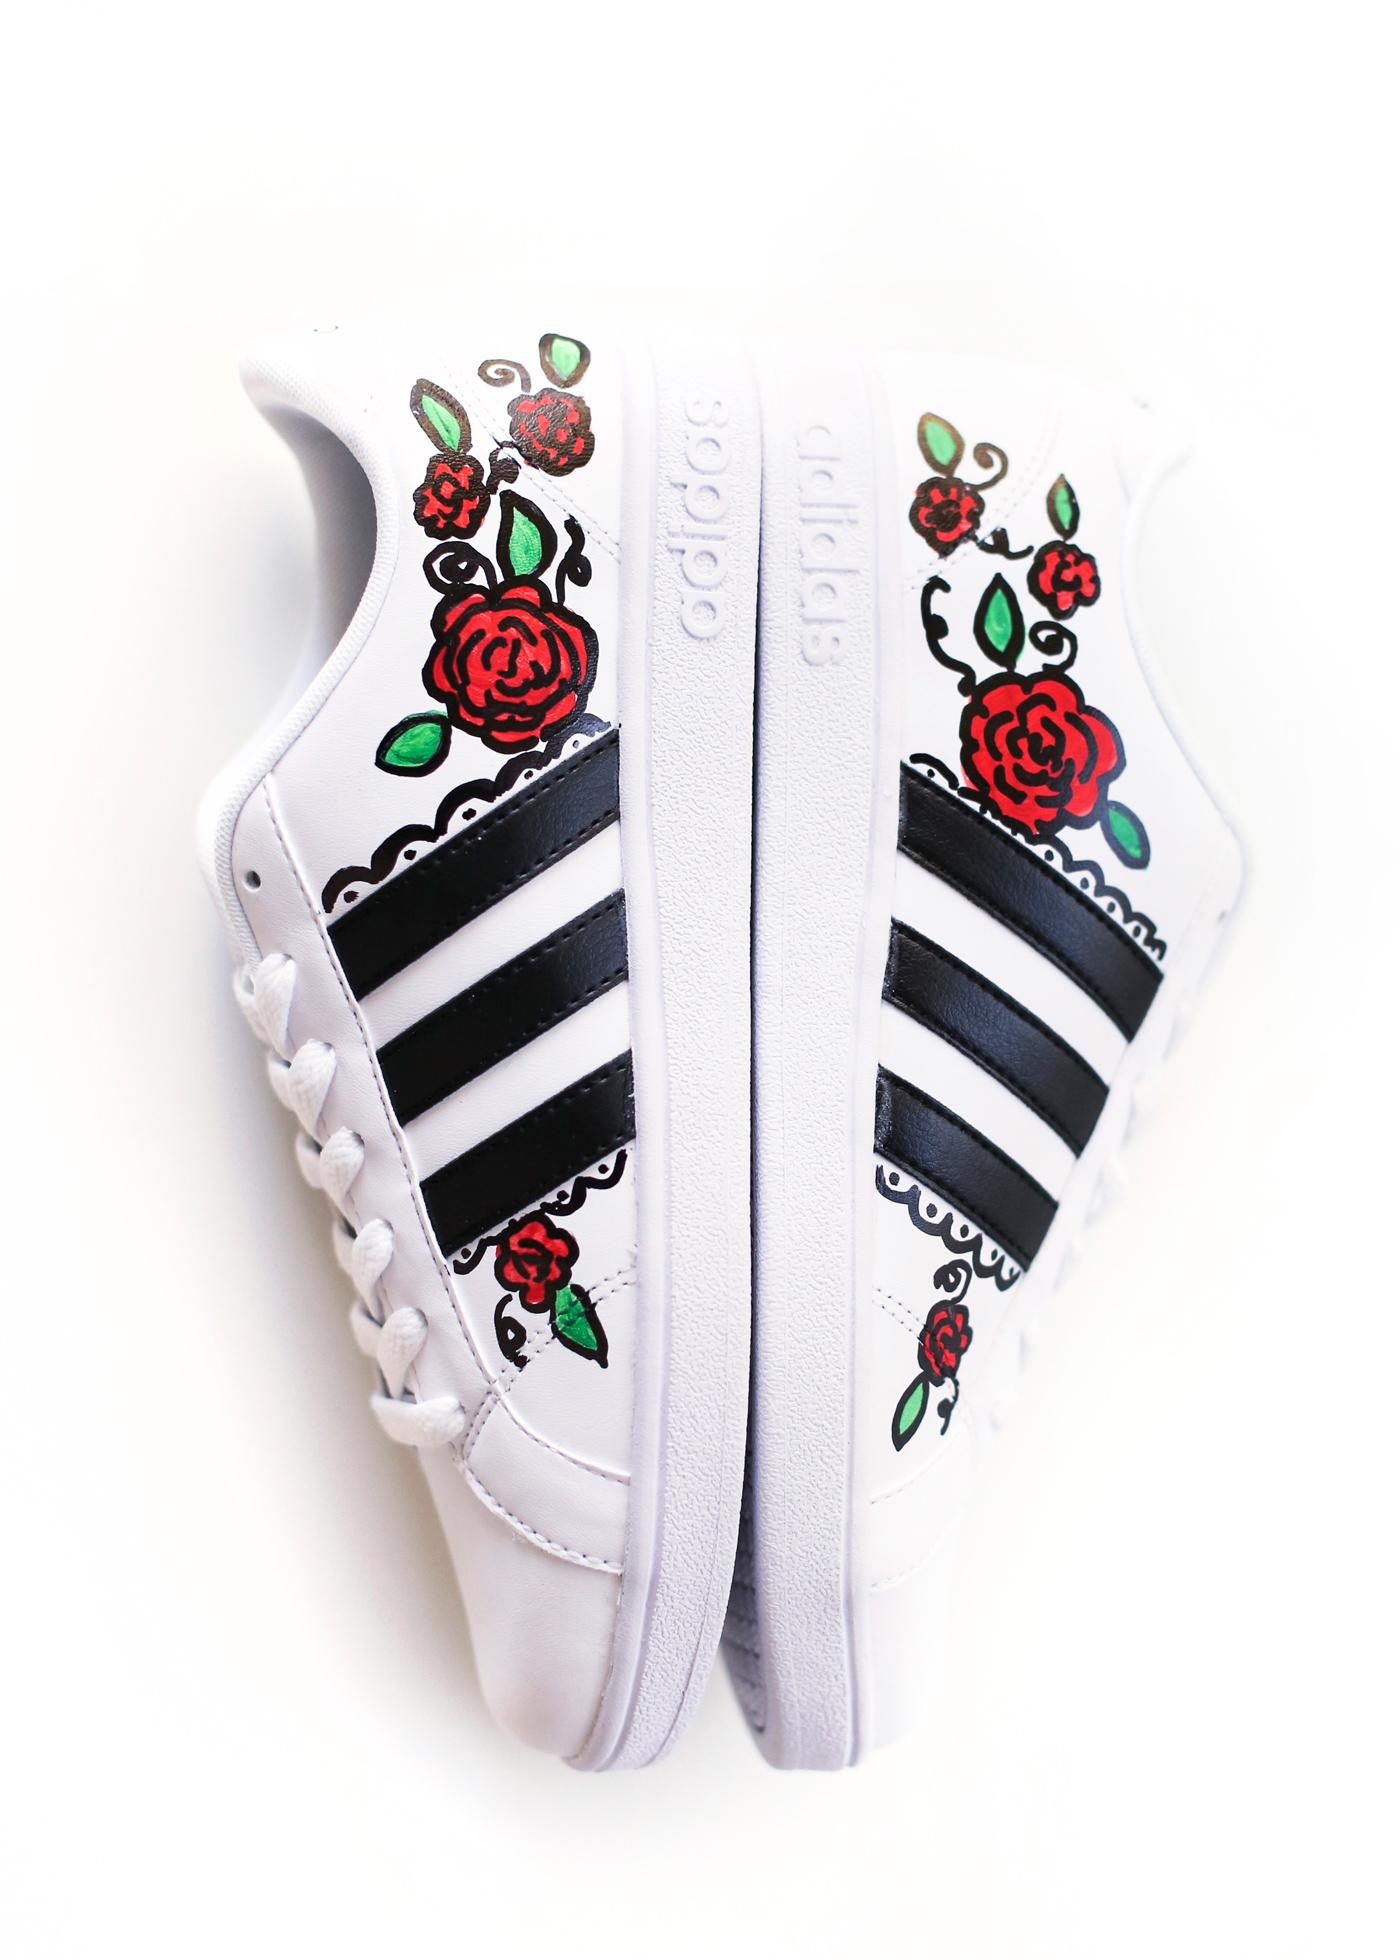 TAOS-Famous-Footwear-Stepforward-Adidas-9